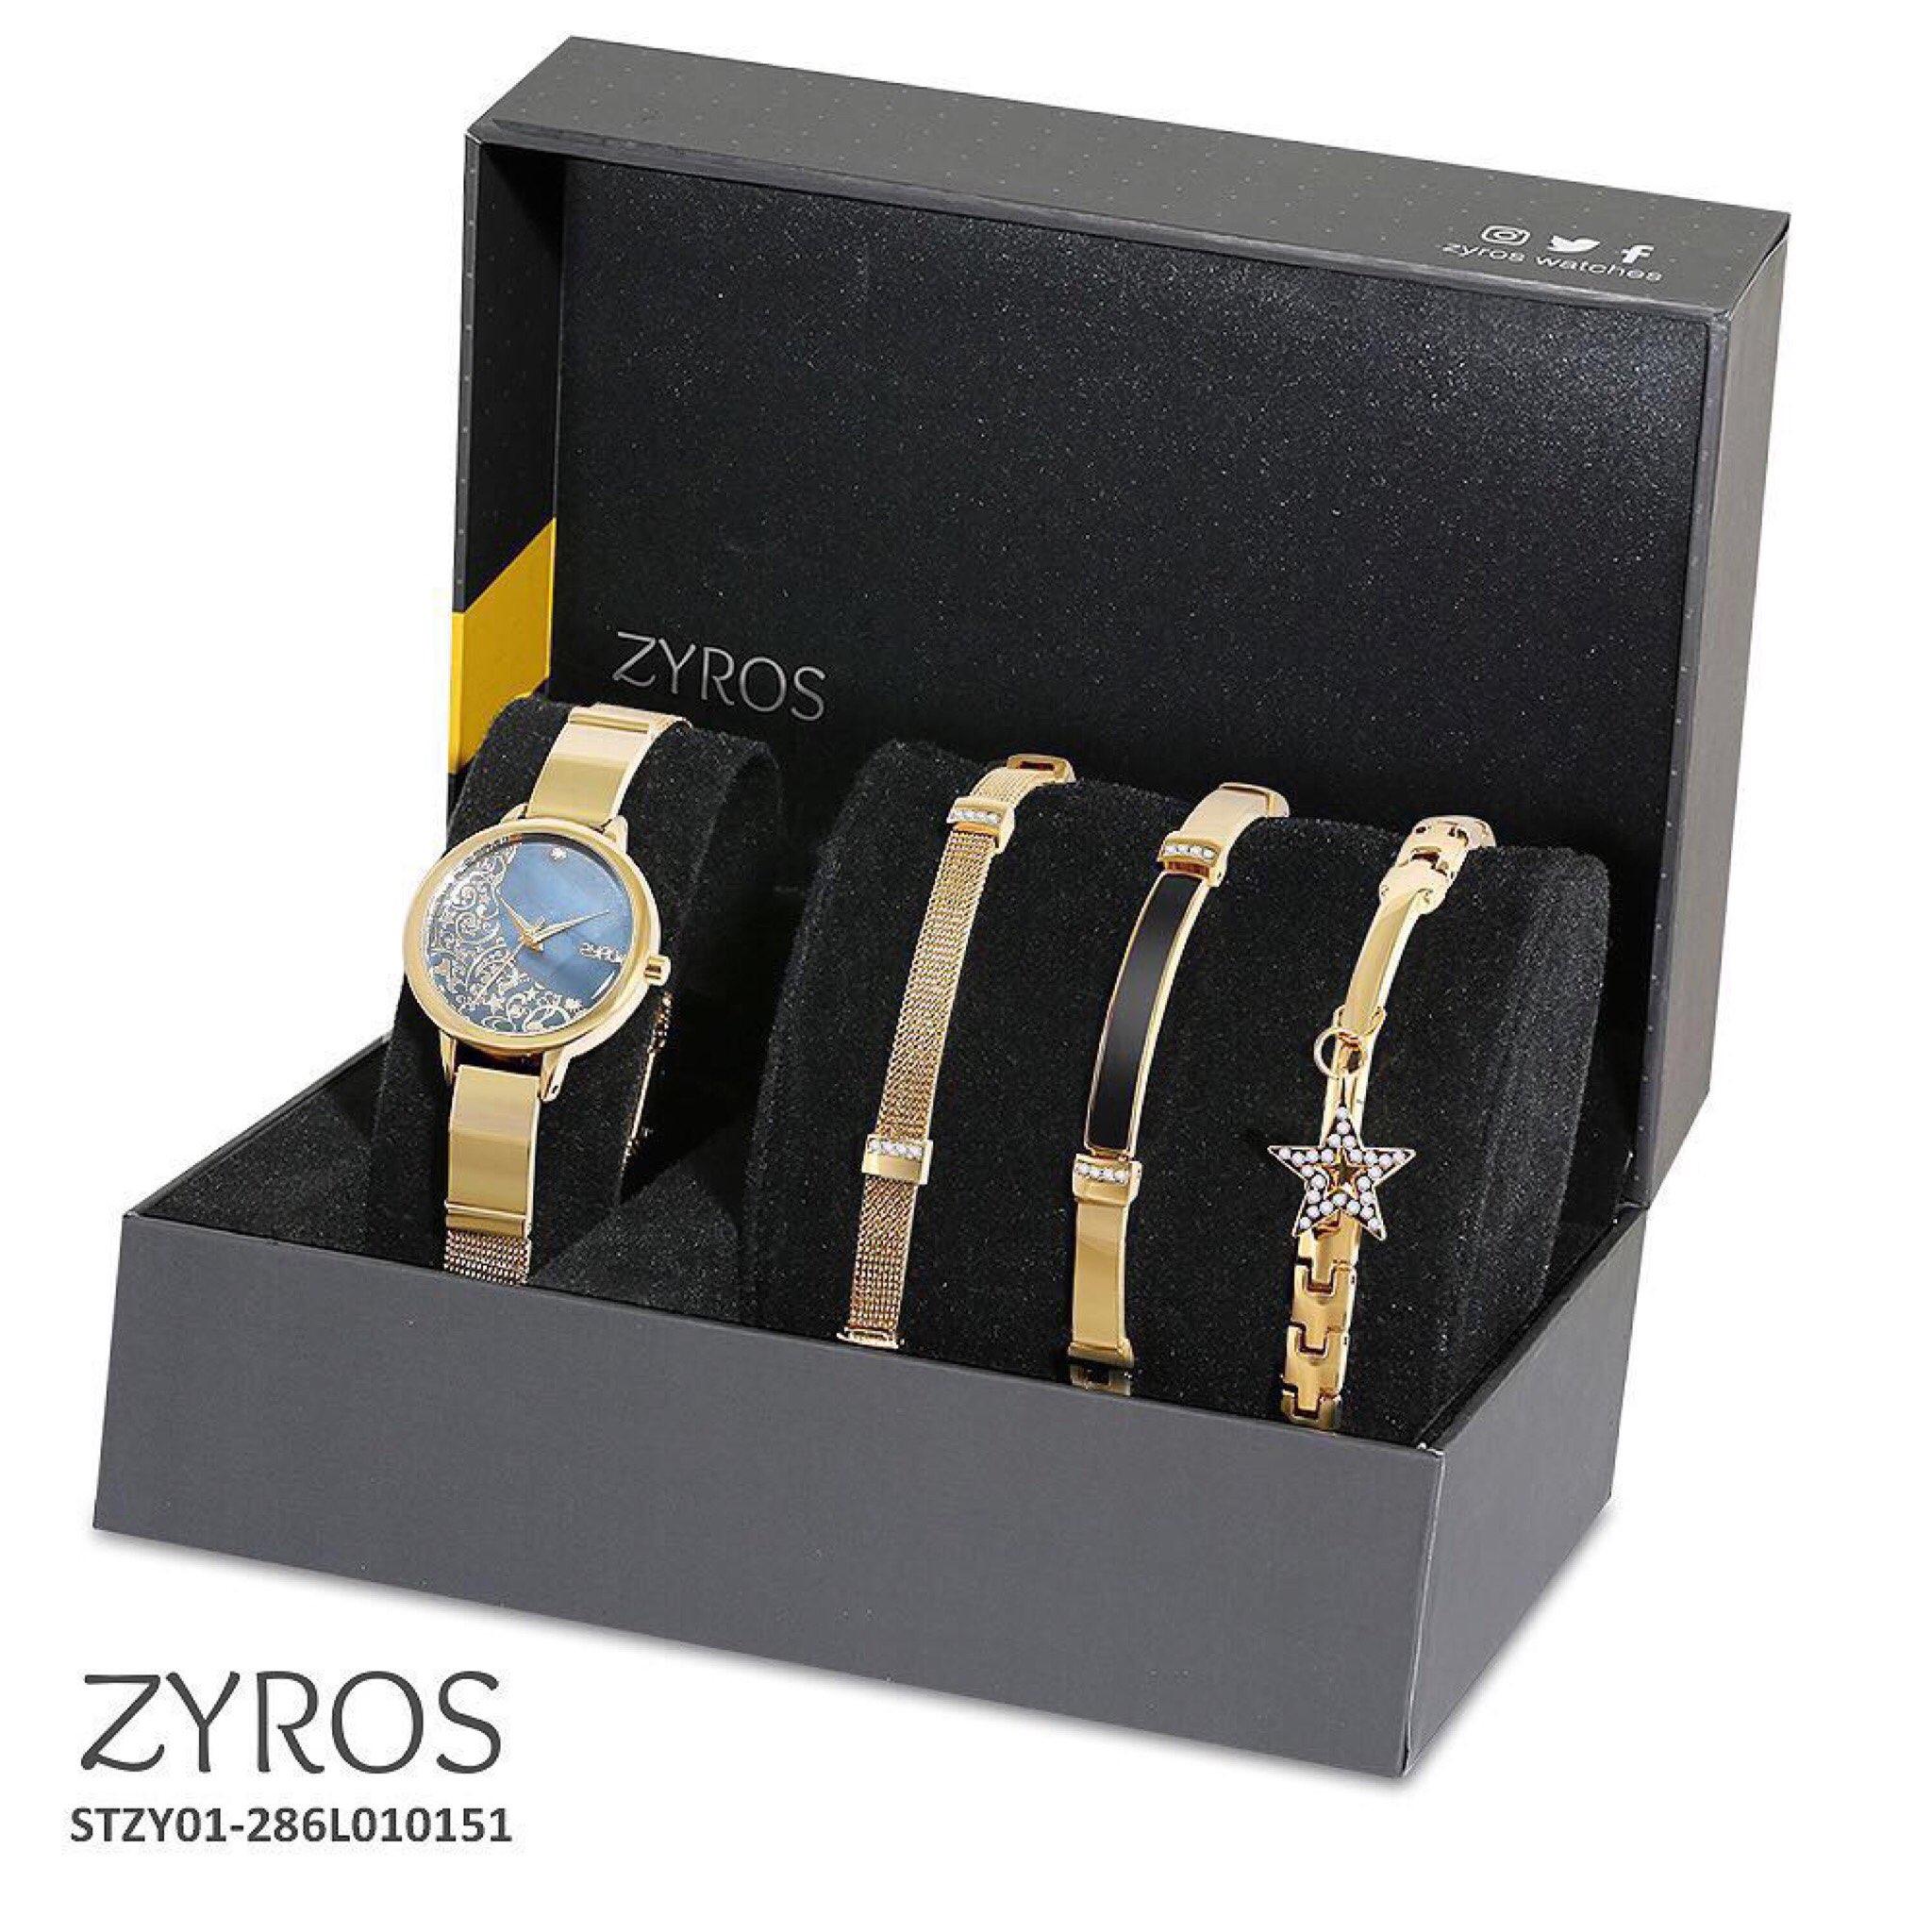 7f14825ed طقم ساعة و3 اساور ماركة زايروس مضمونة واصلية 💯 | loleettaah